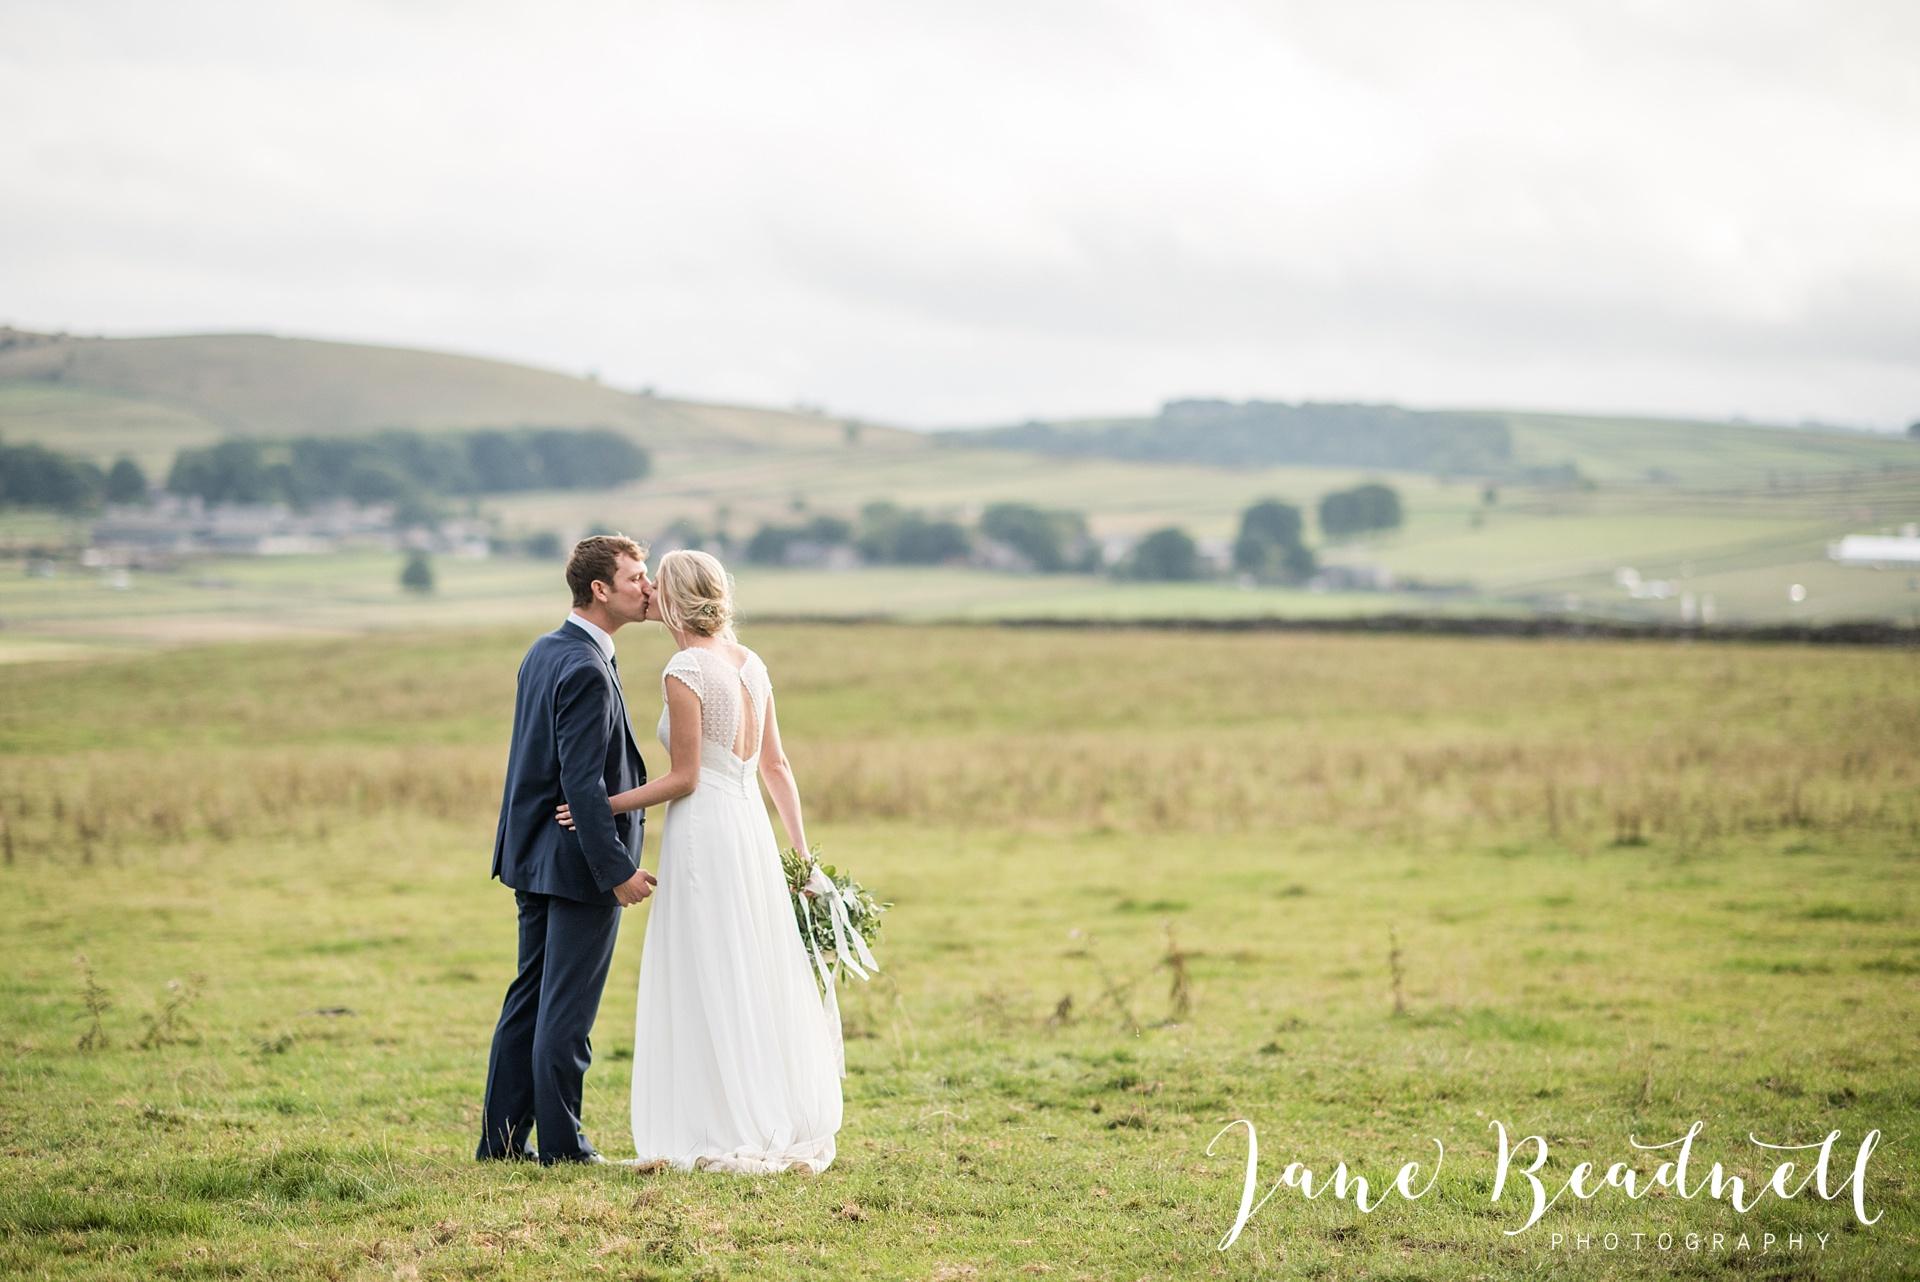 Marquee wedding photography Sheffield wedding photographer Jane Beadnell Photography